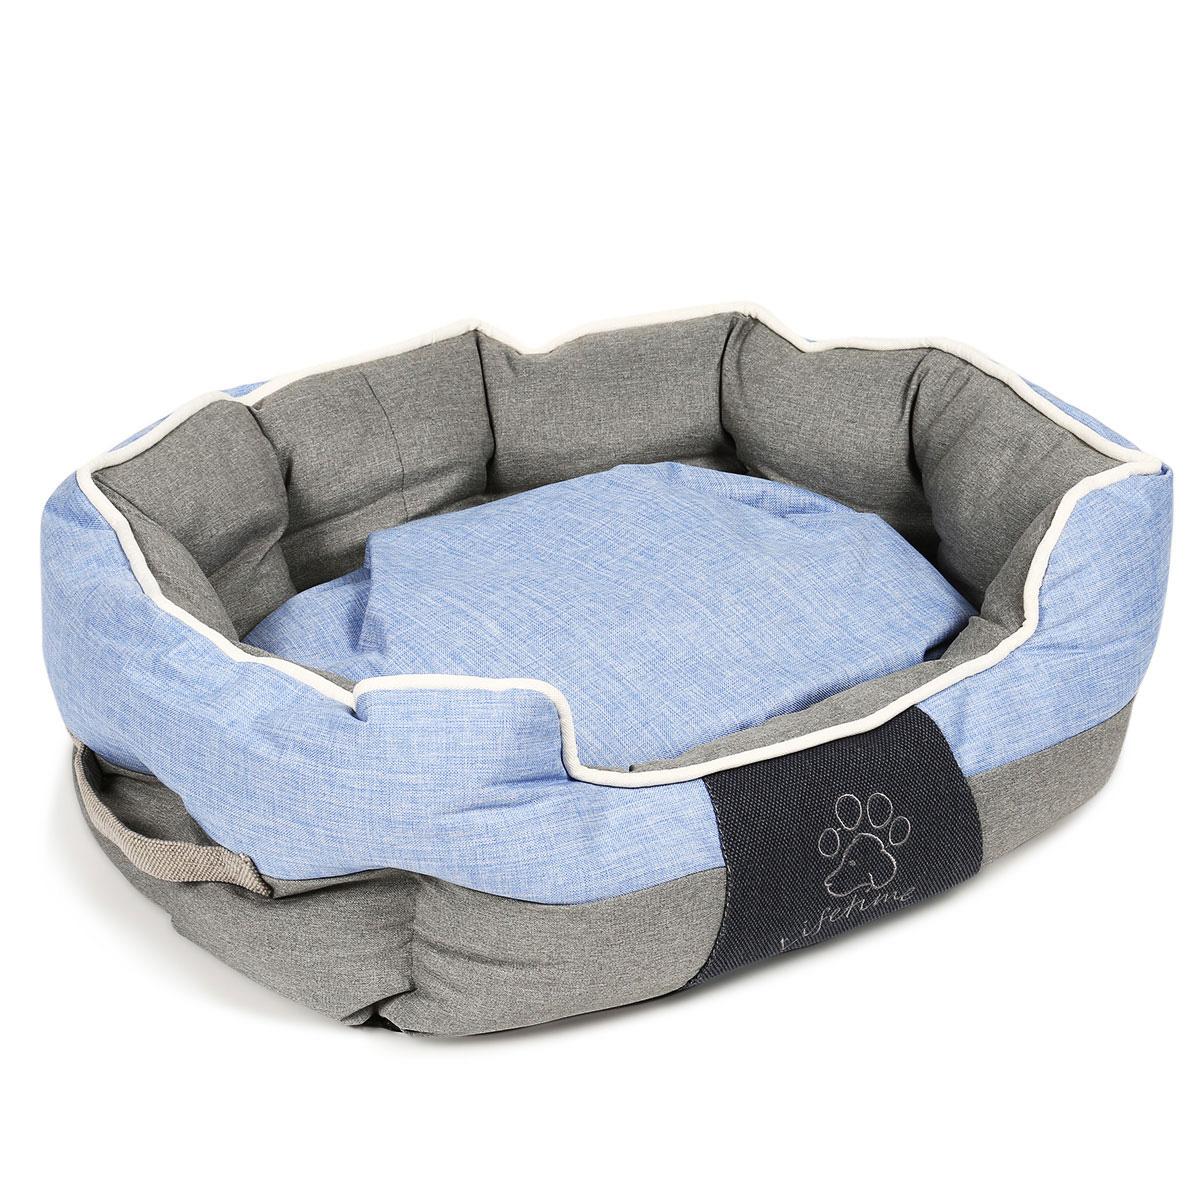 trixie bett joris grau blau g nstig kaufen bei zooroyal. Black Bedroom Furniture Sets. Home Design Ideas